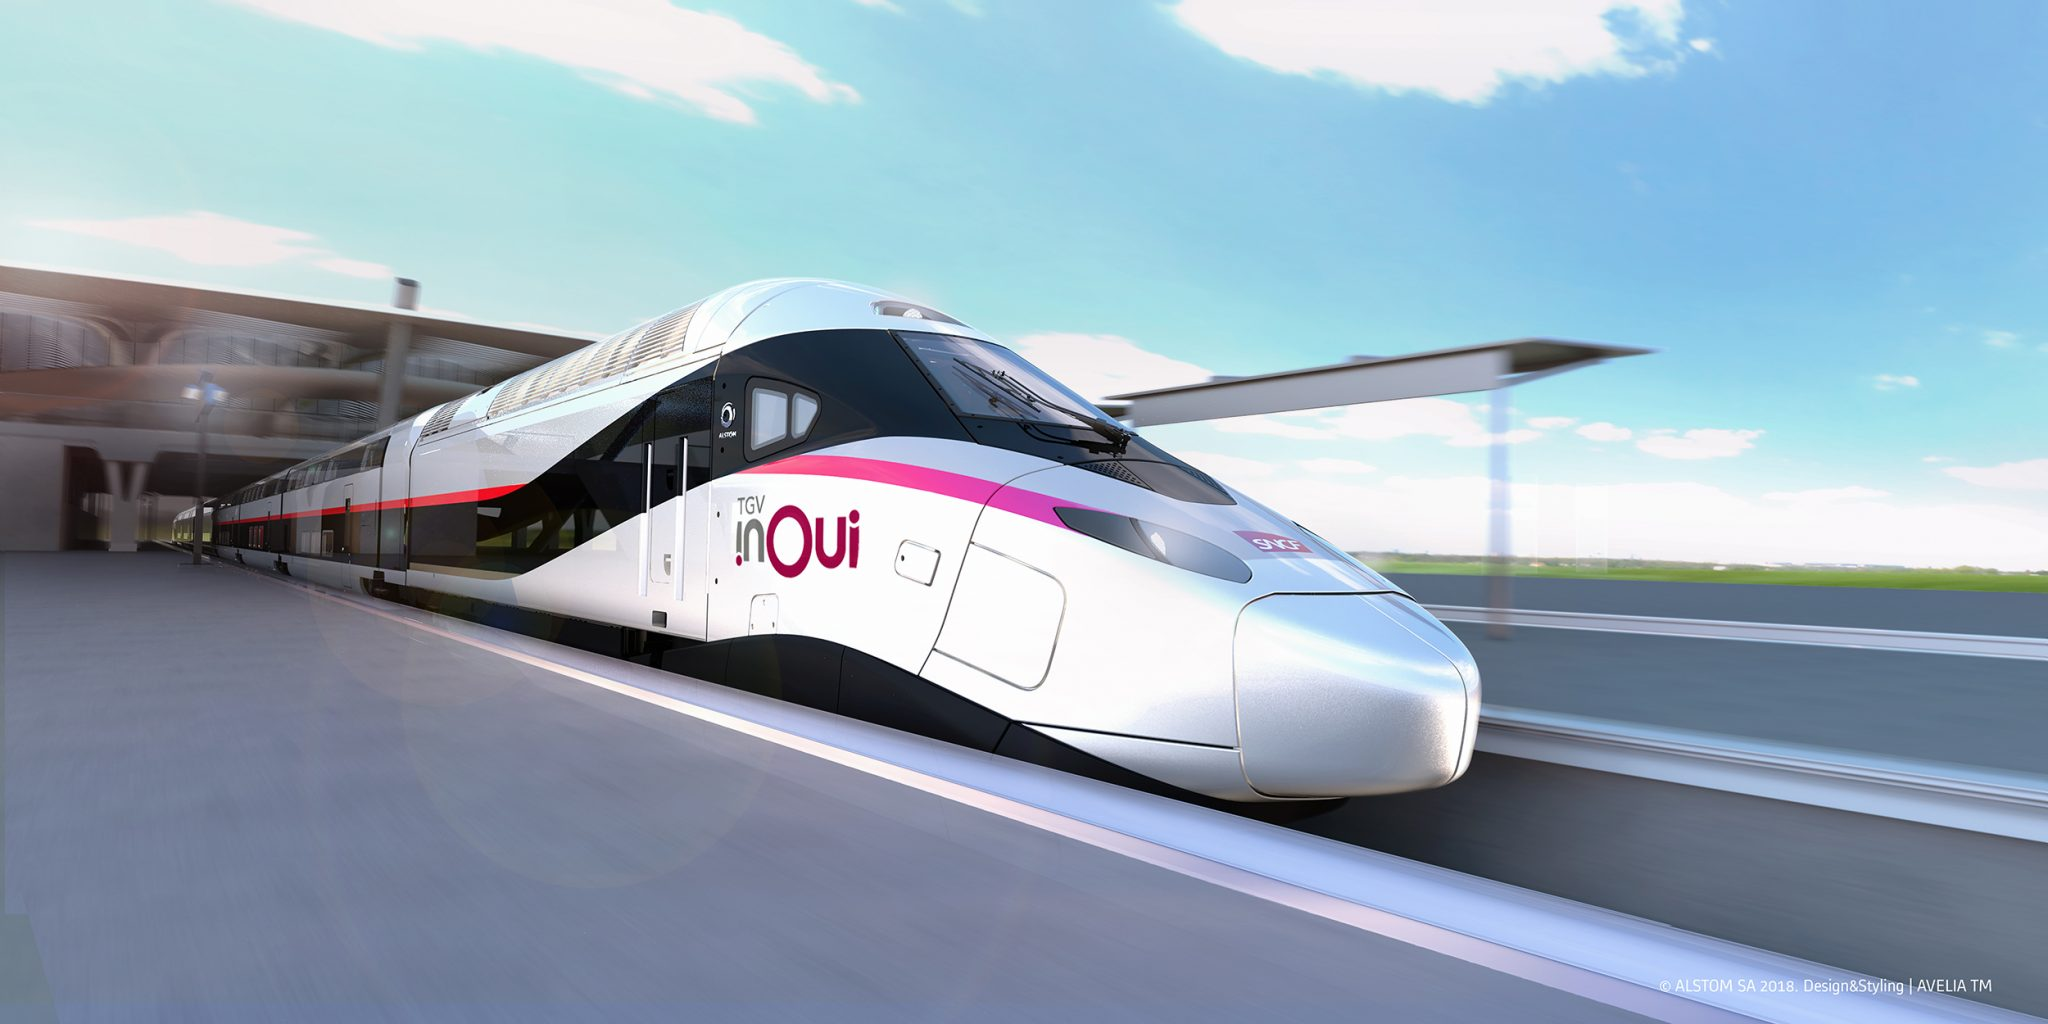 TGV Inoui SNCF Alstom